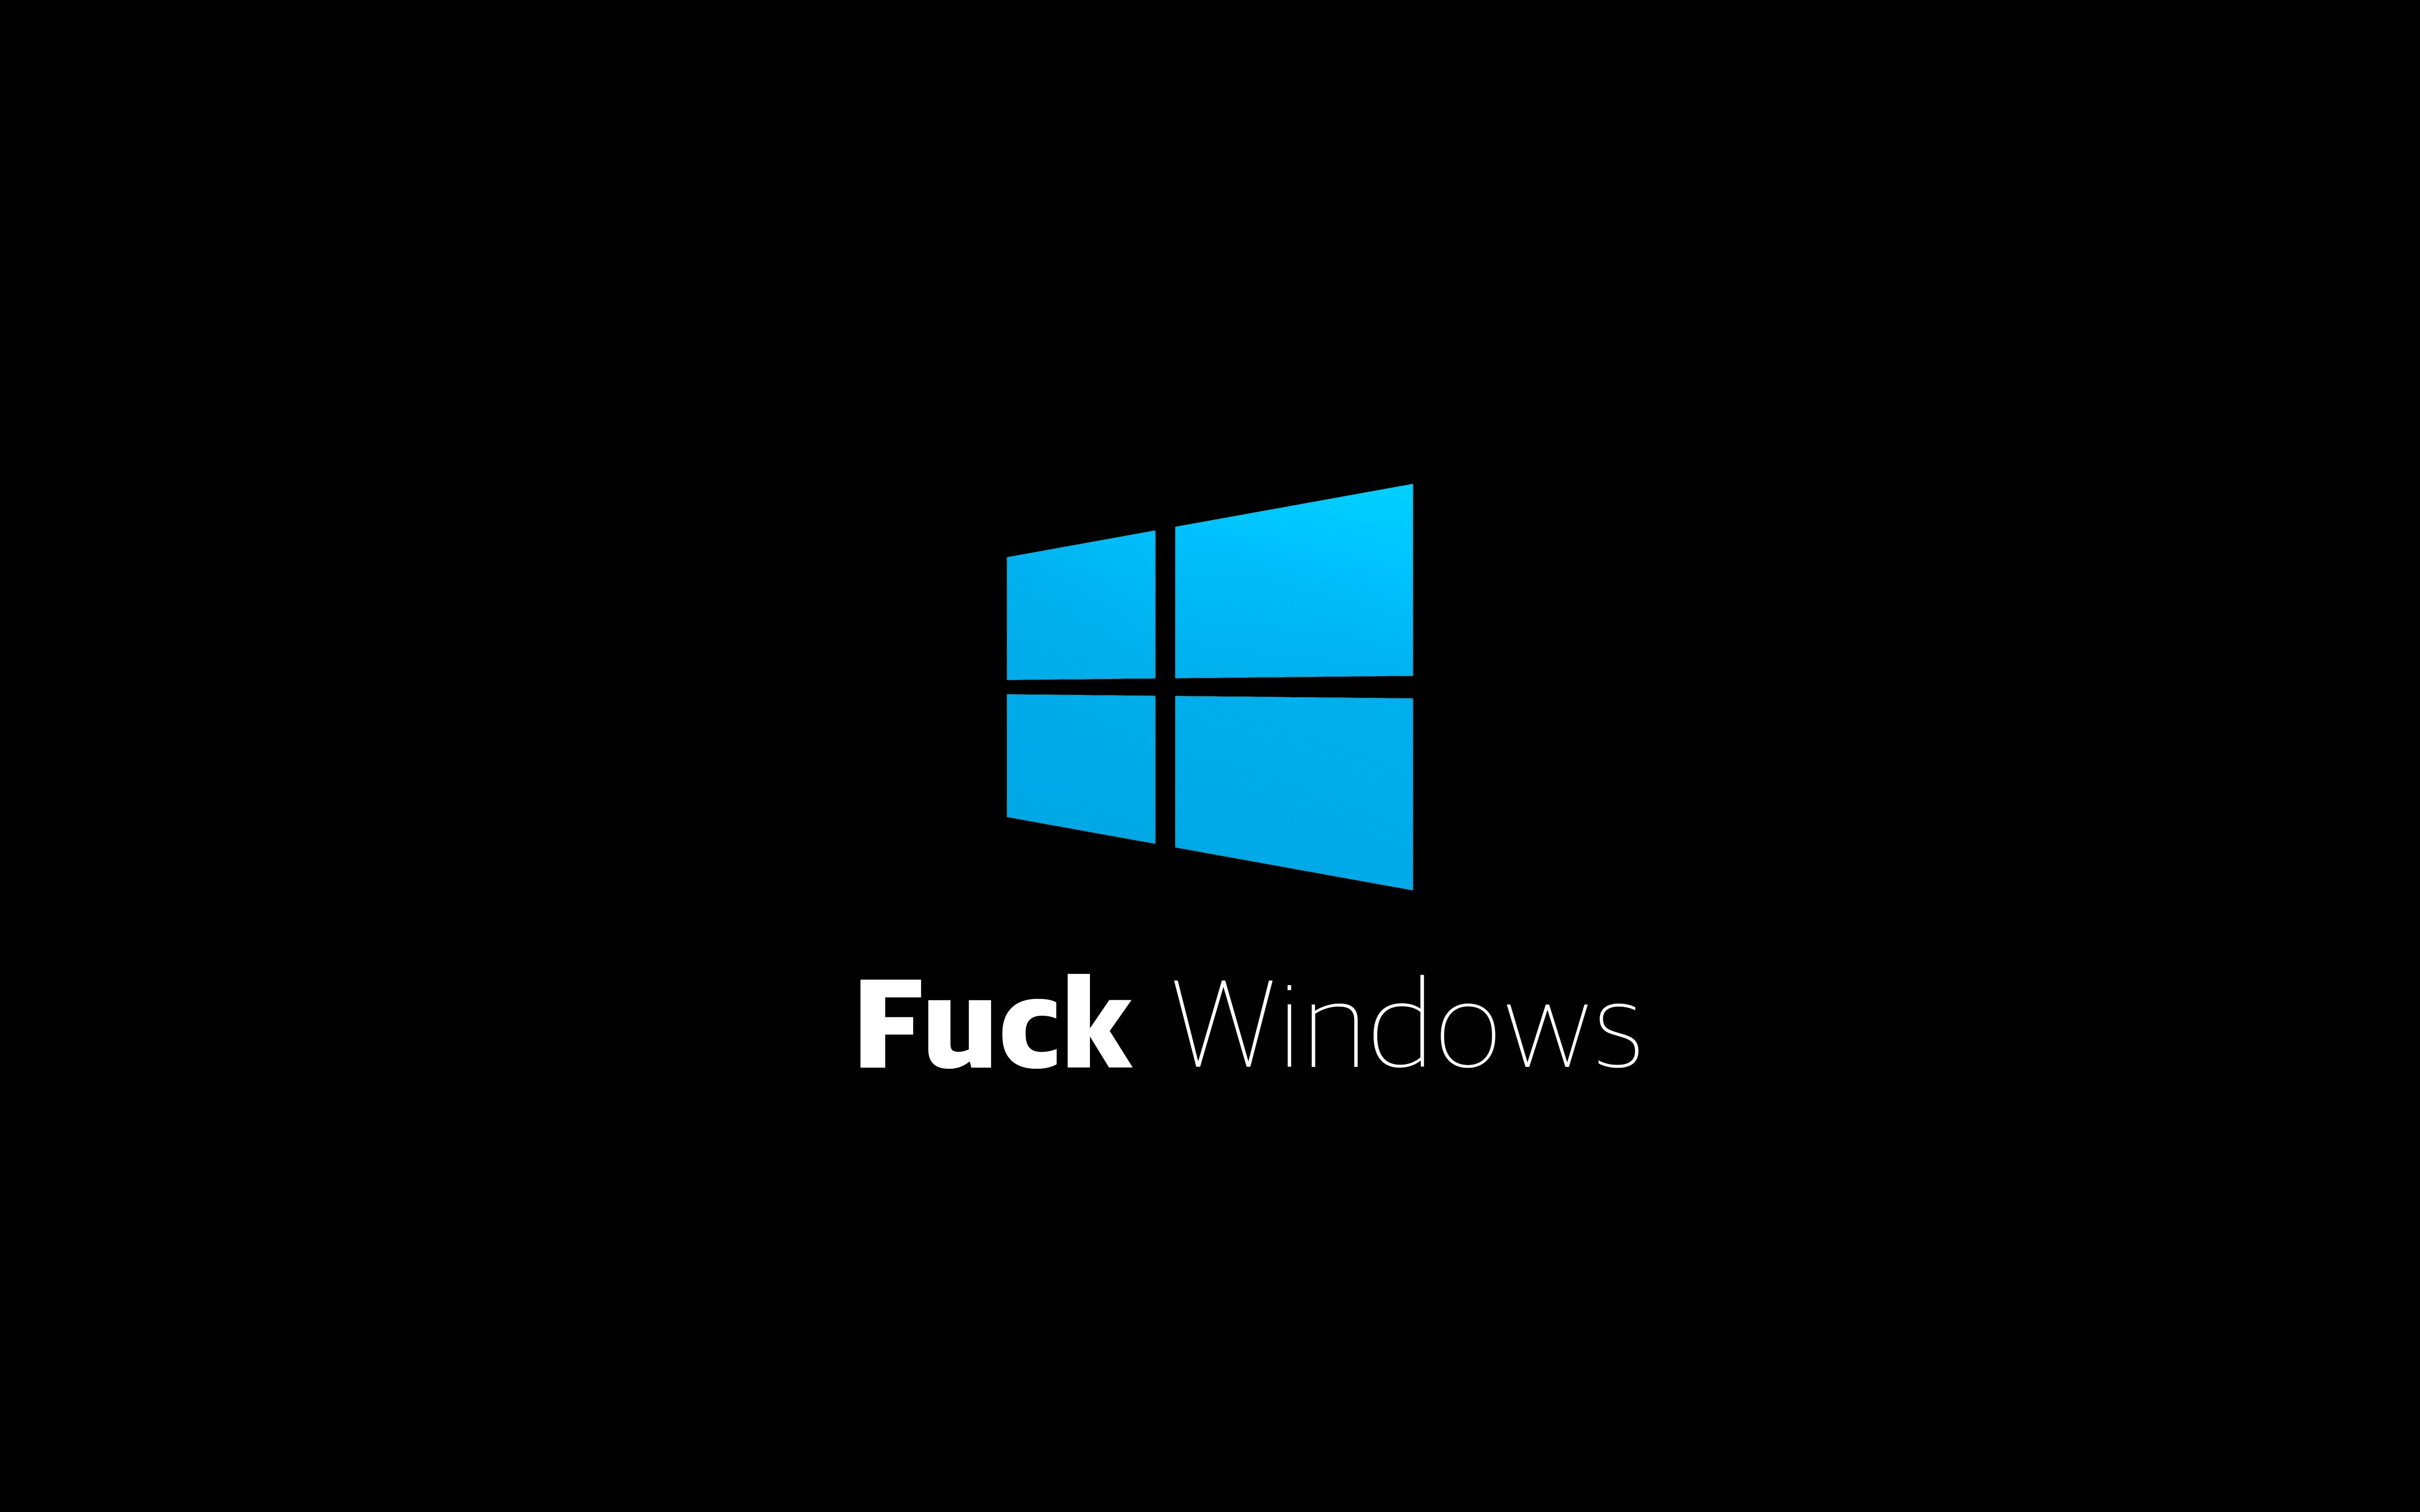 Wallpaper Windows 10 Microsoft Fuck 5120x3200